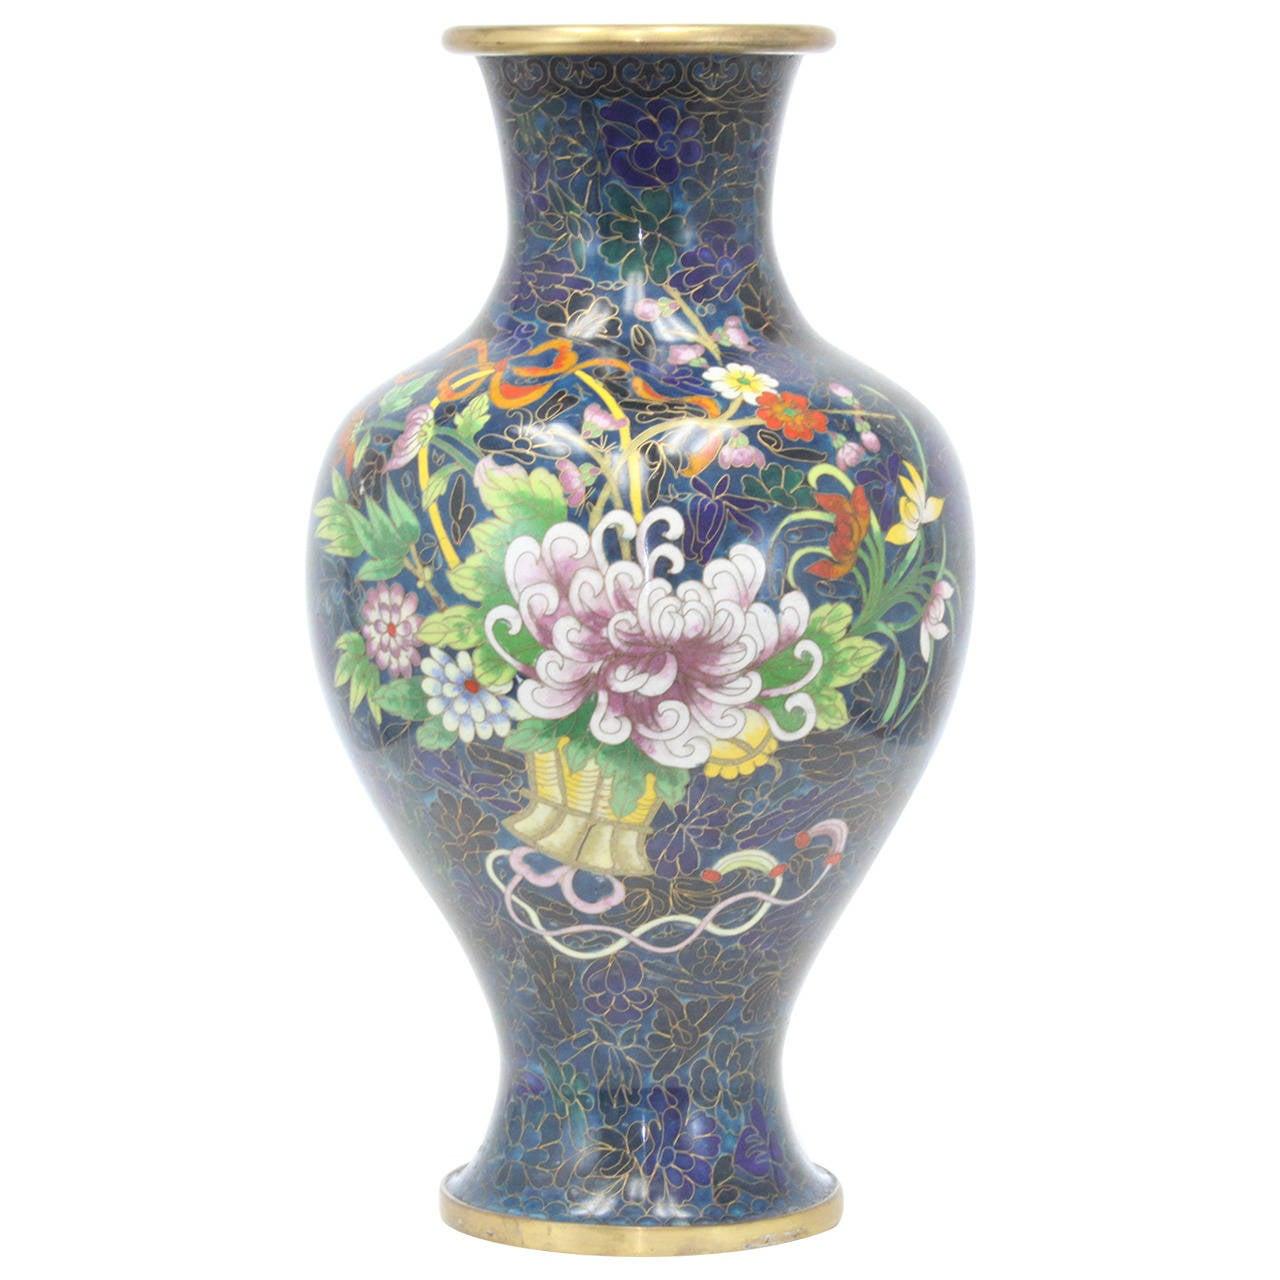 16 tall cloisonne vase in royal blue flower basket design at 1stdibs 16 tall cloisonne vase in royal blue flower basket design for sale reviewsmspy